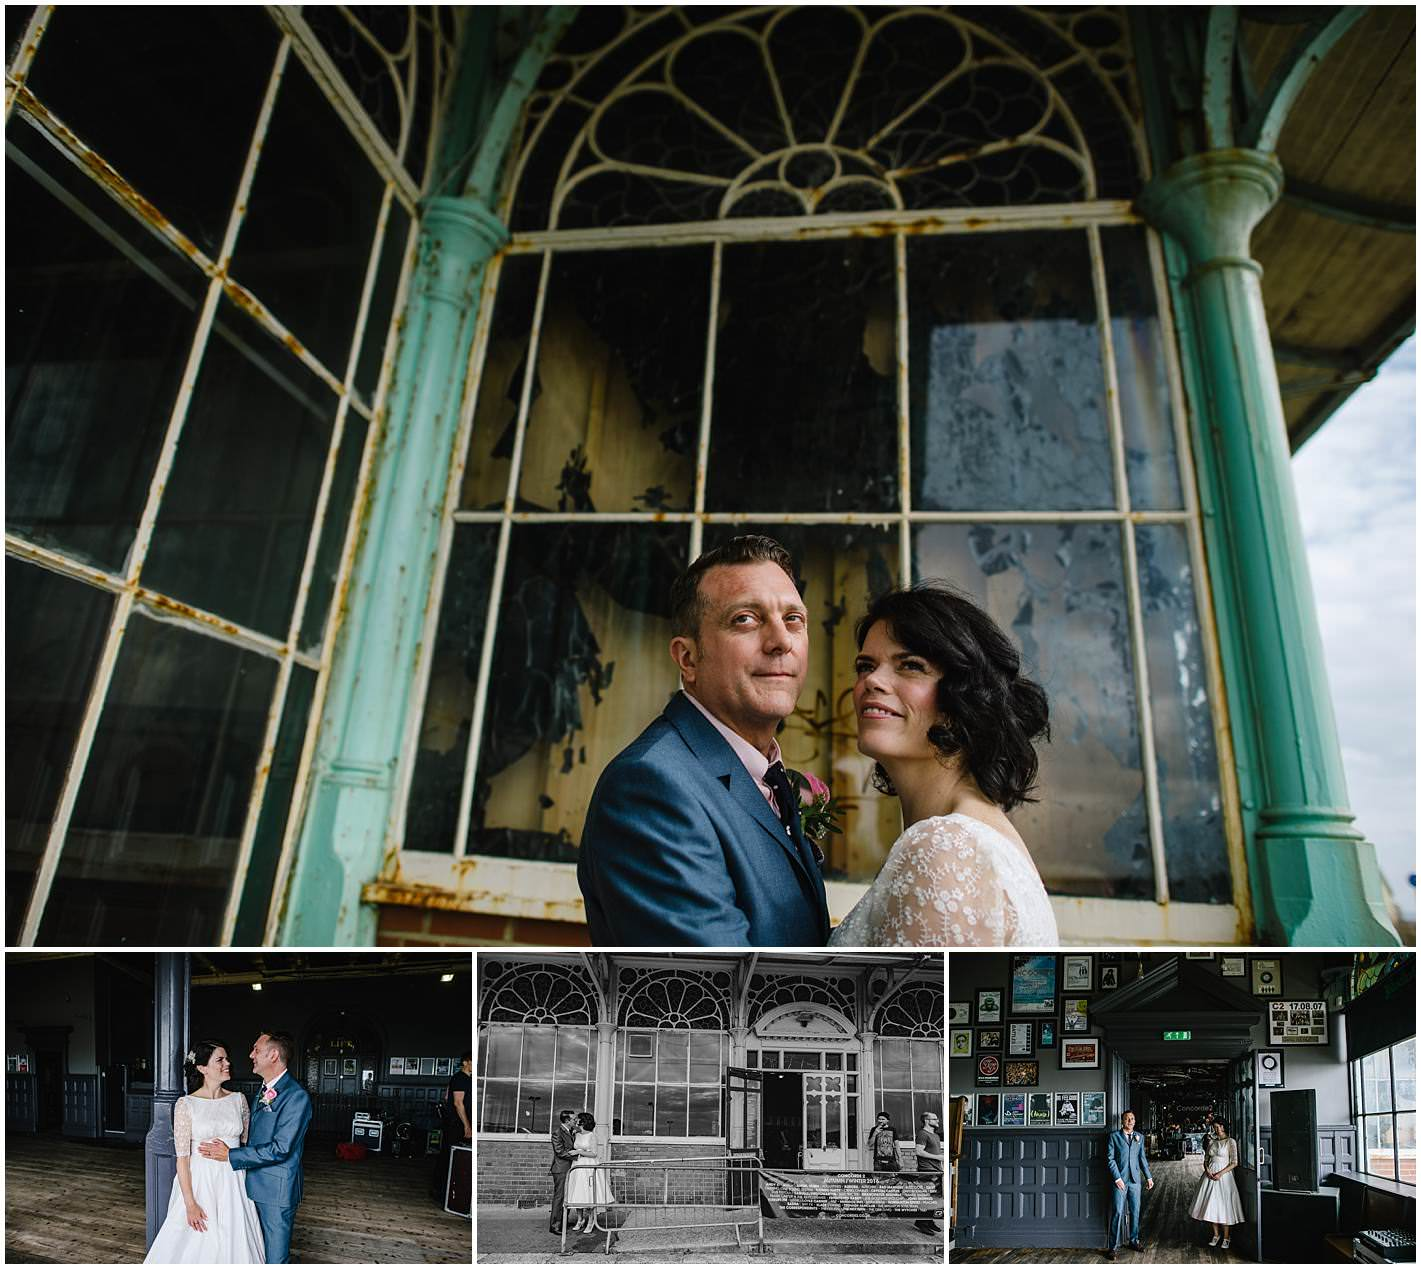 royal-pavilion-wedding-brighton402